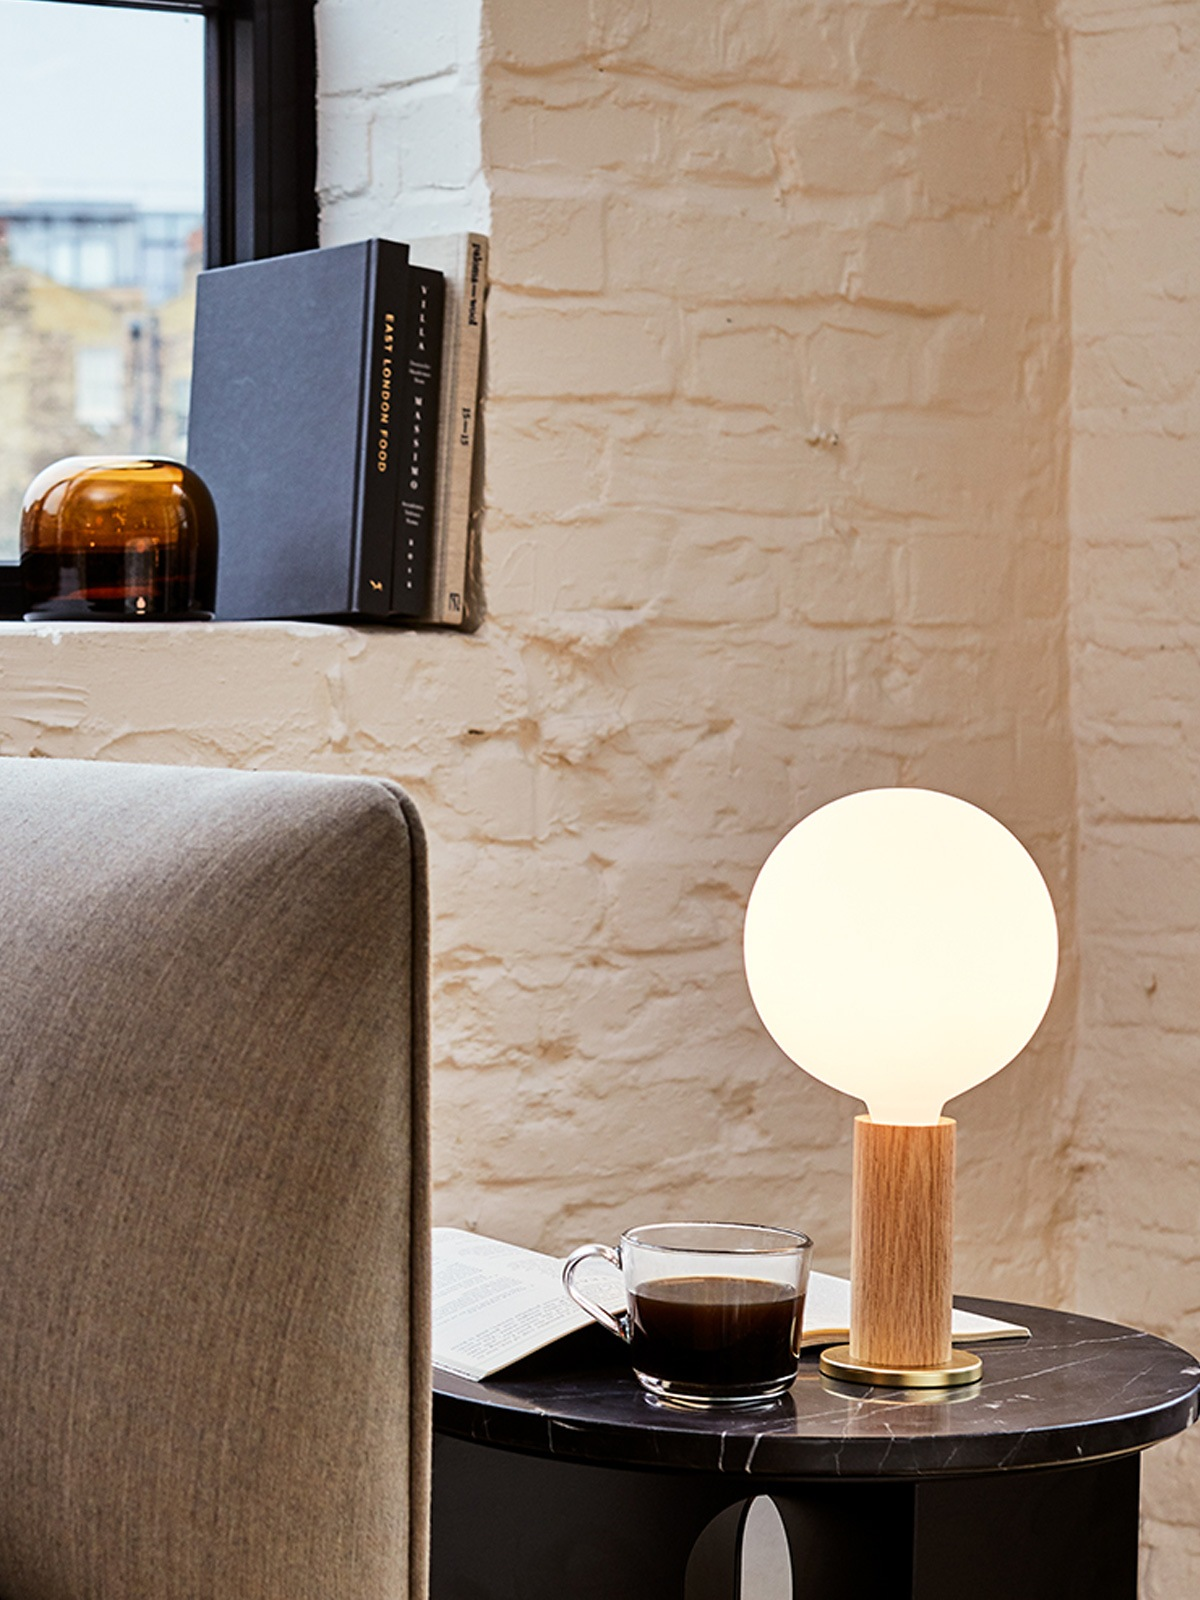 Tischleuchte mit großer Glas Birne Knuckle Table Lamp Holz Tala DesignOrt Berlin Lampen